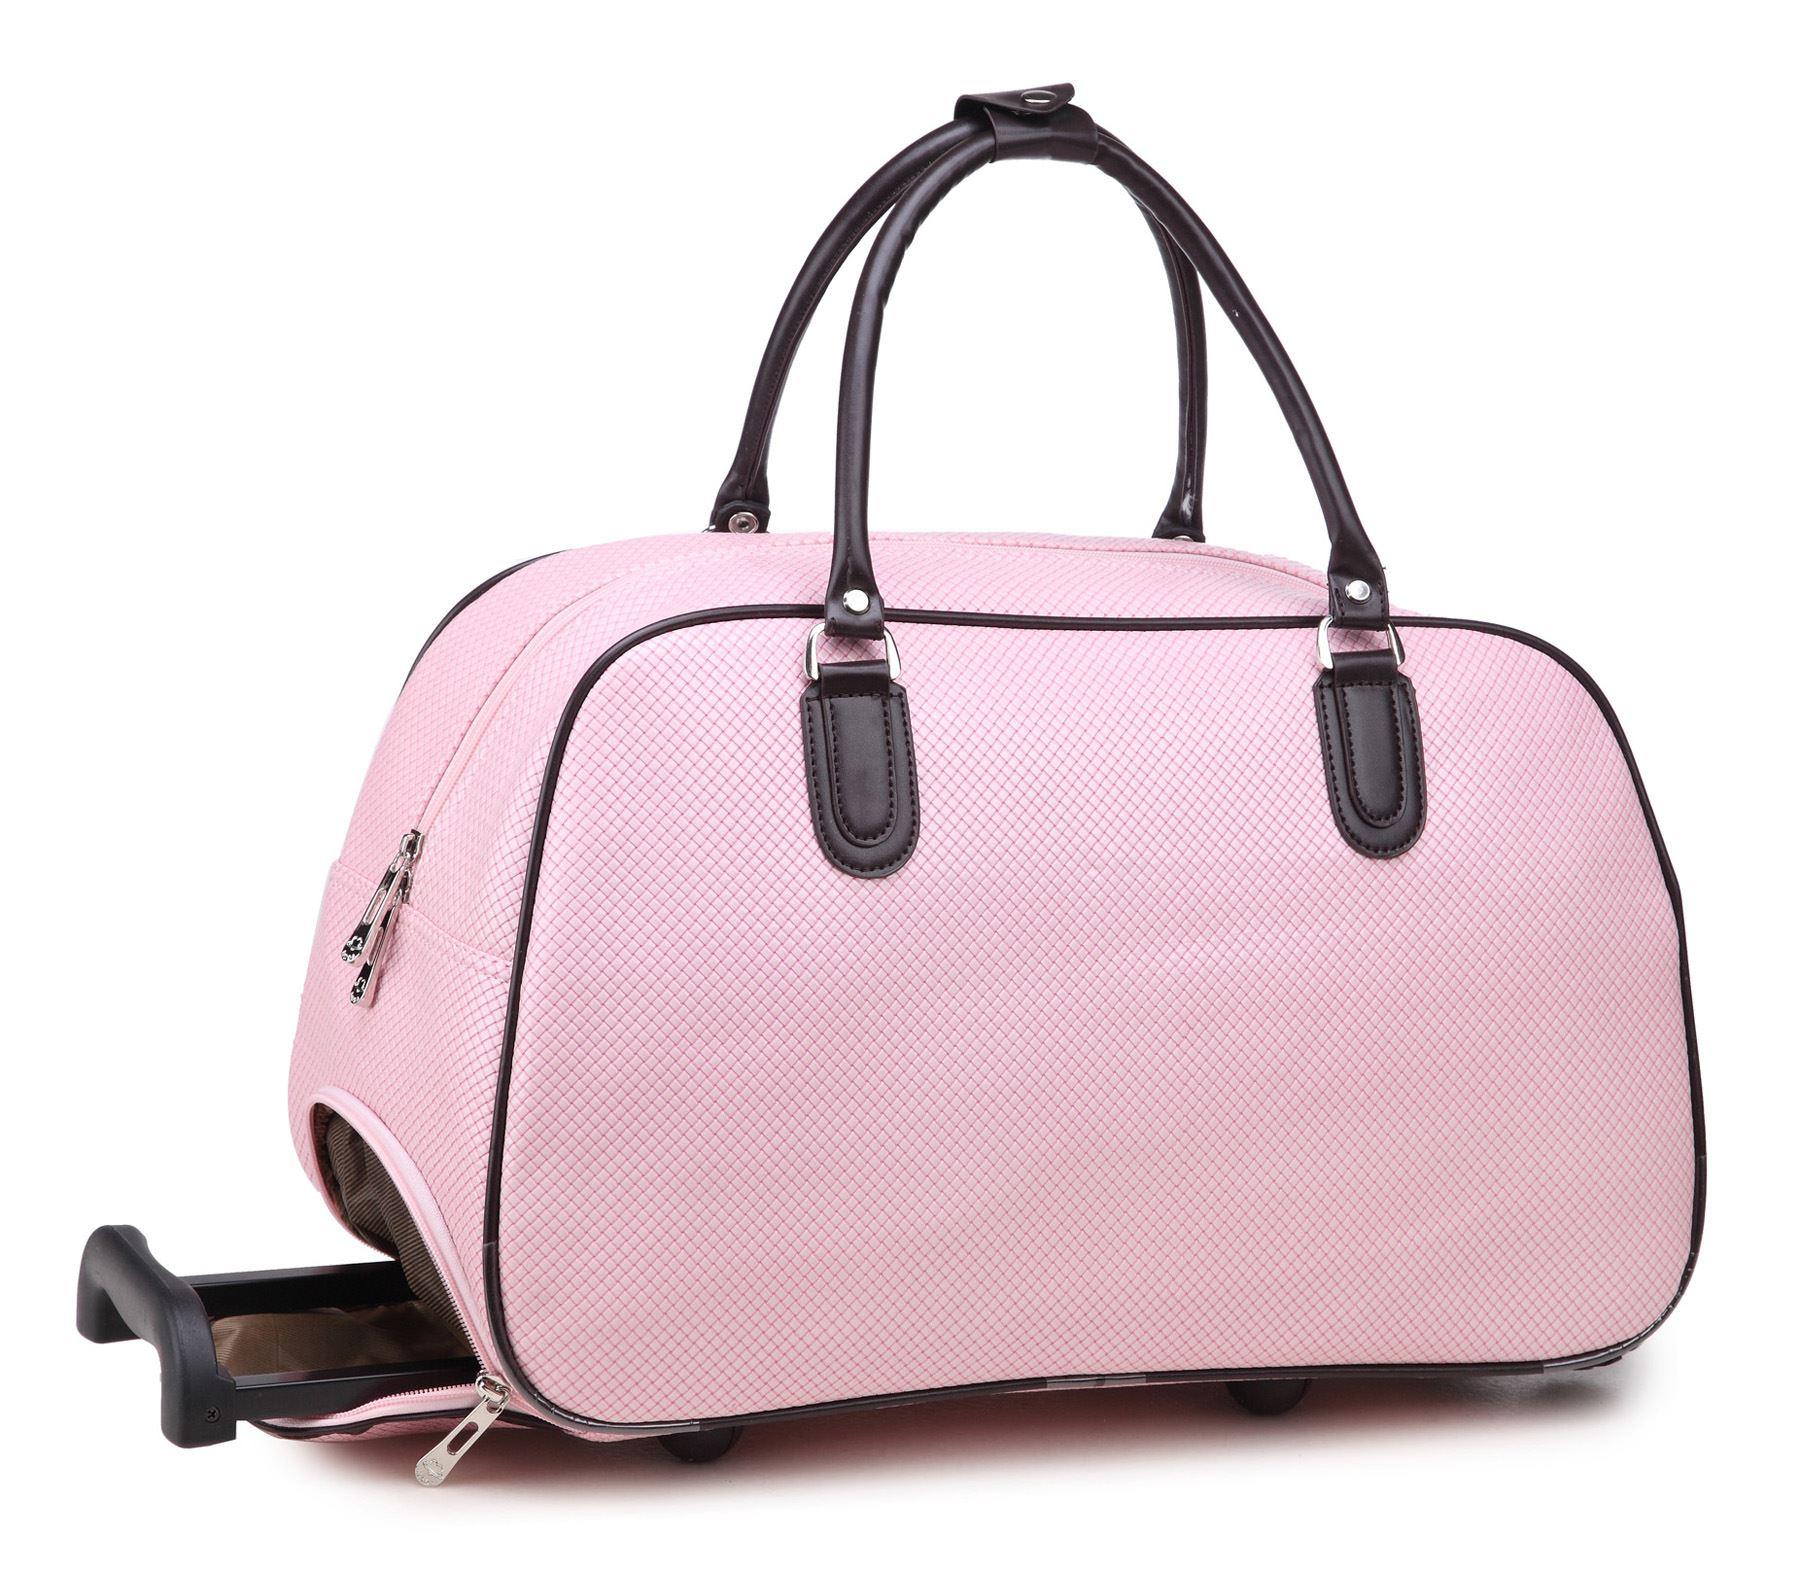 Big Handbag In Flight Holiday Travel Holdall Hand Luggage Weekend ...